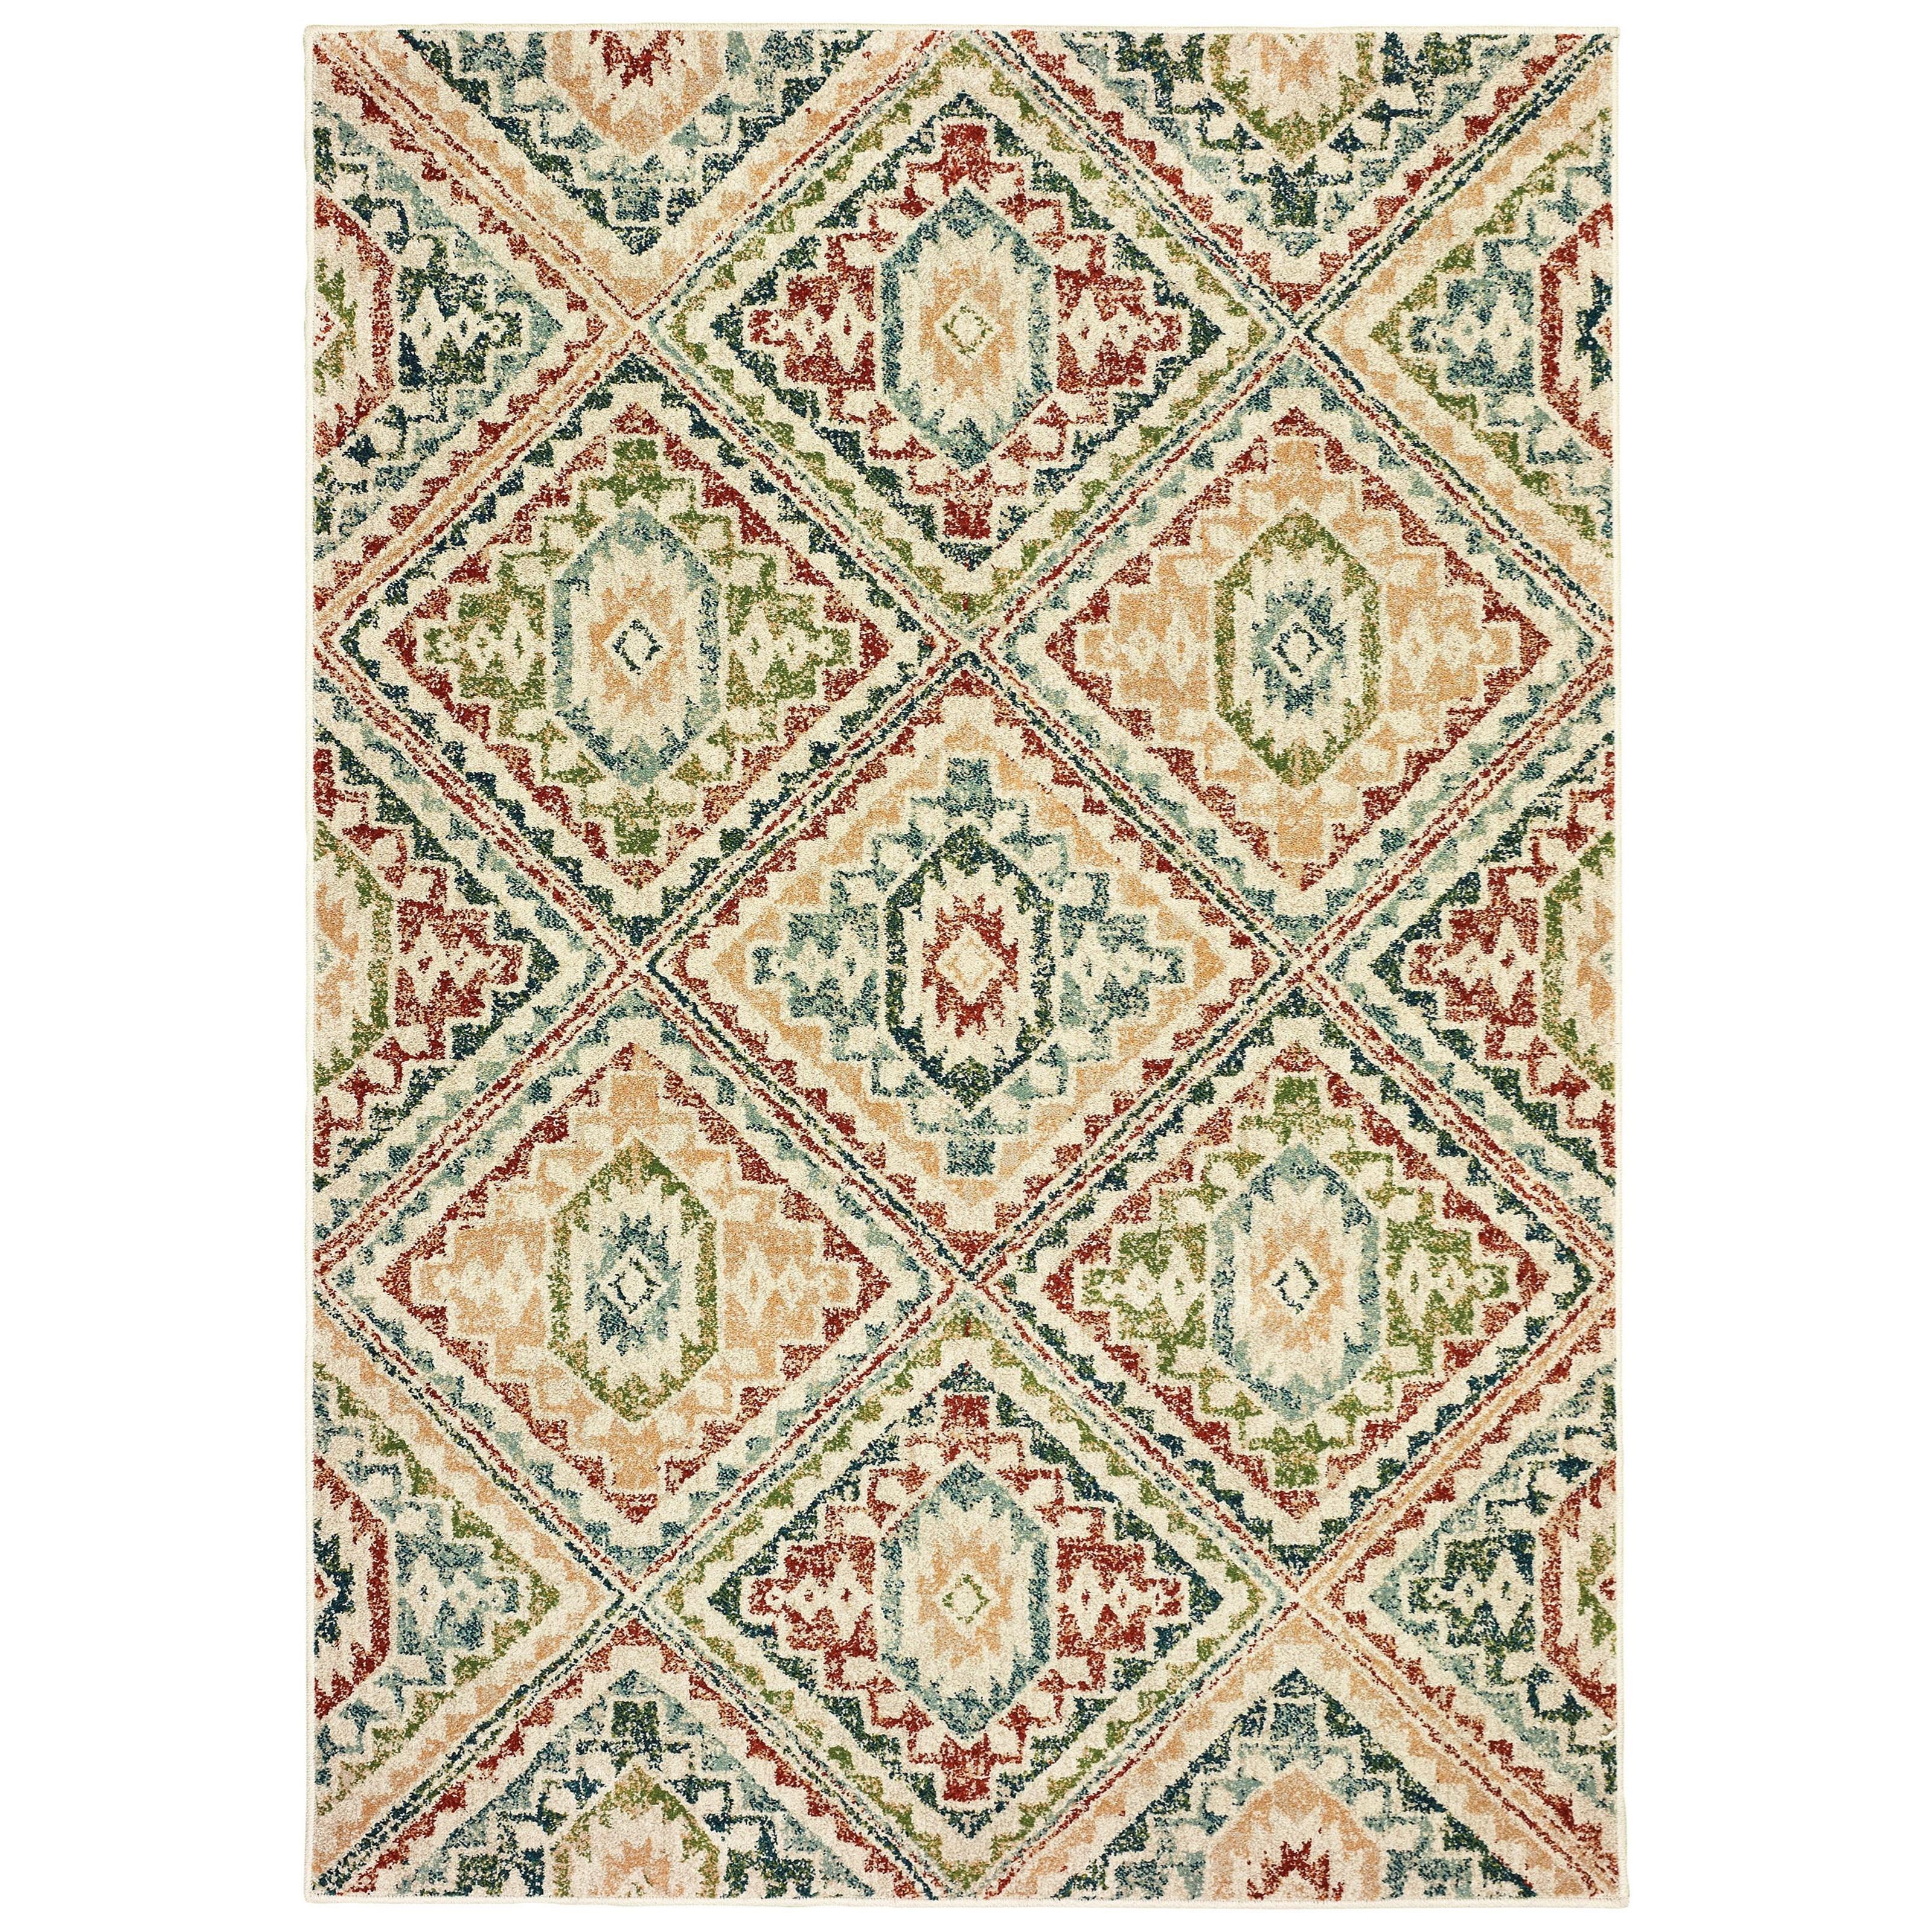 "Dawson 5' 3"" X  7' 6"" Rectangle Rug by Oriental Weavers at Novello Home Furnishings"